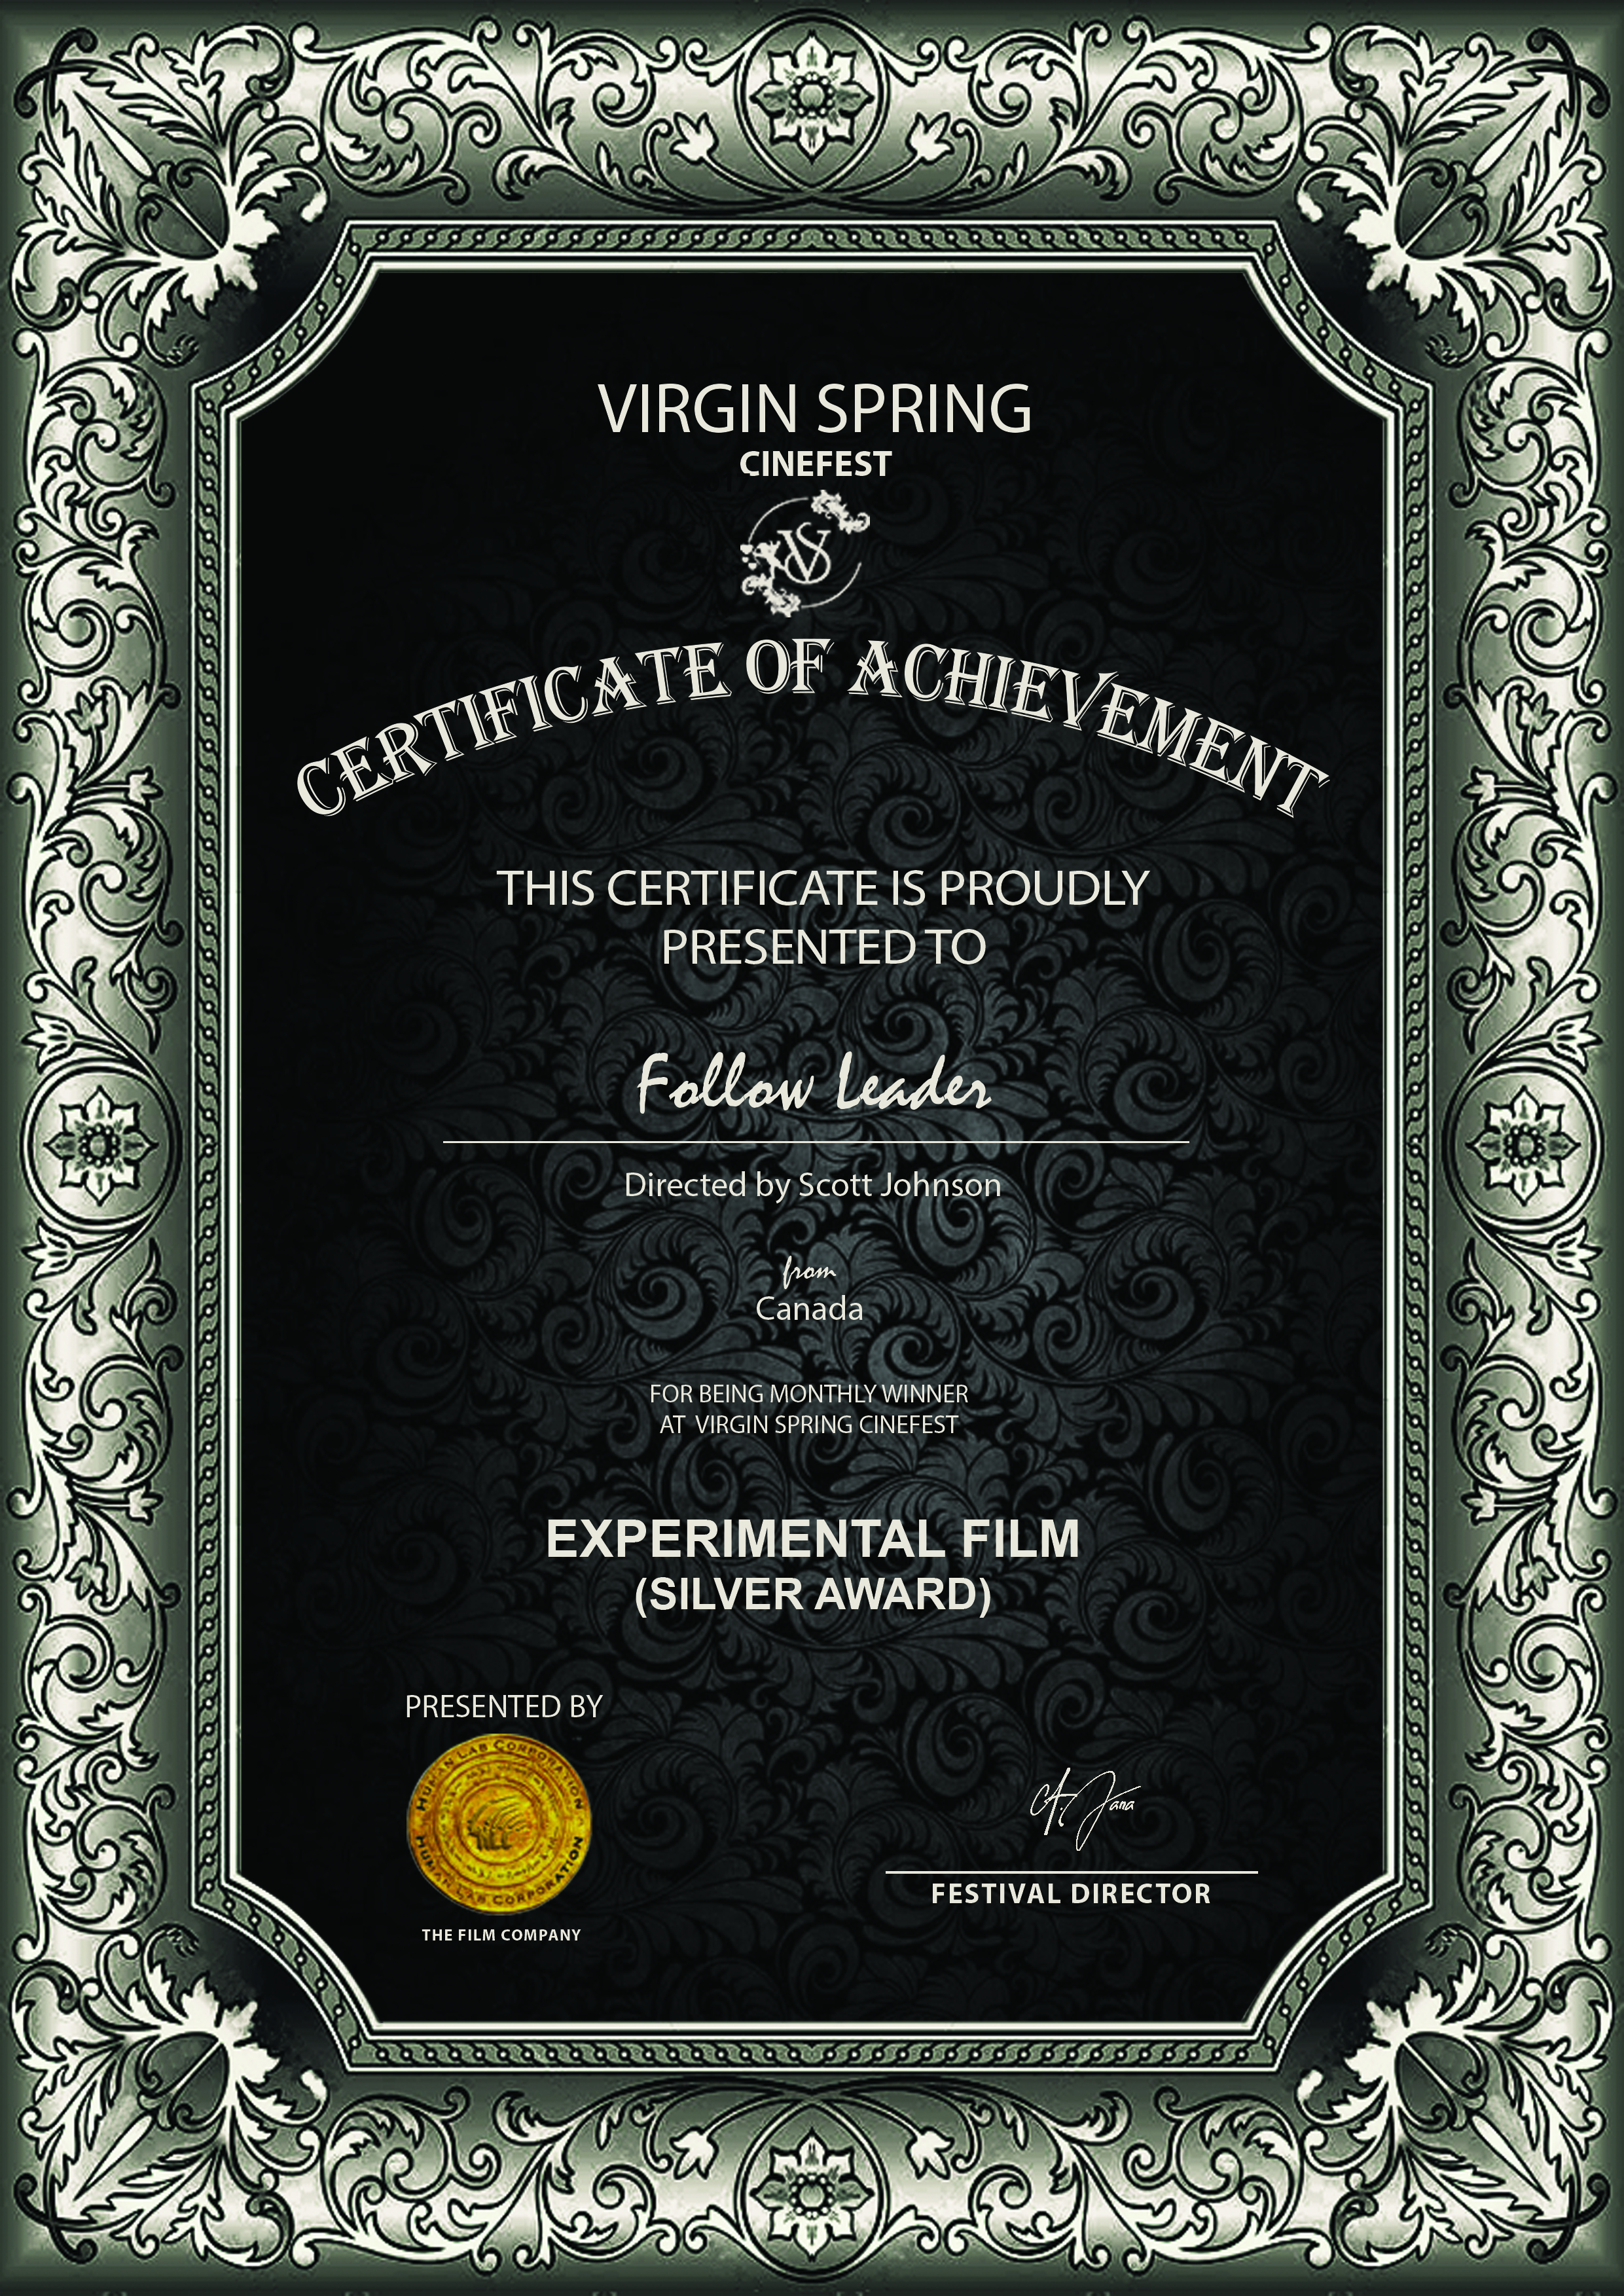 Virgin Spring CineFest - EXPERIMENTAL FILM (SILVER)